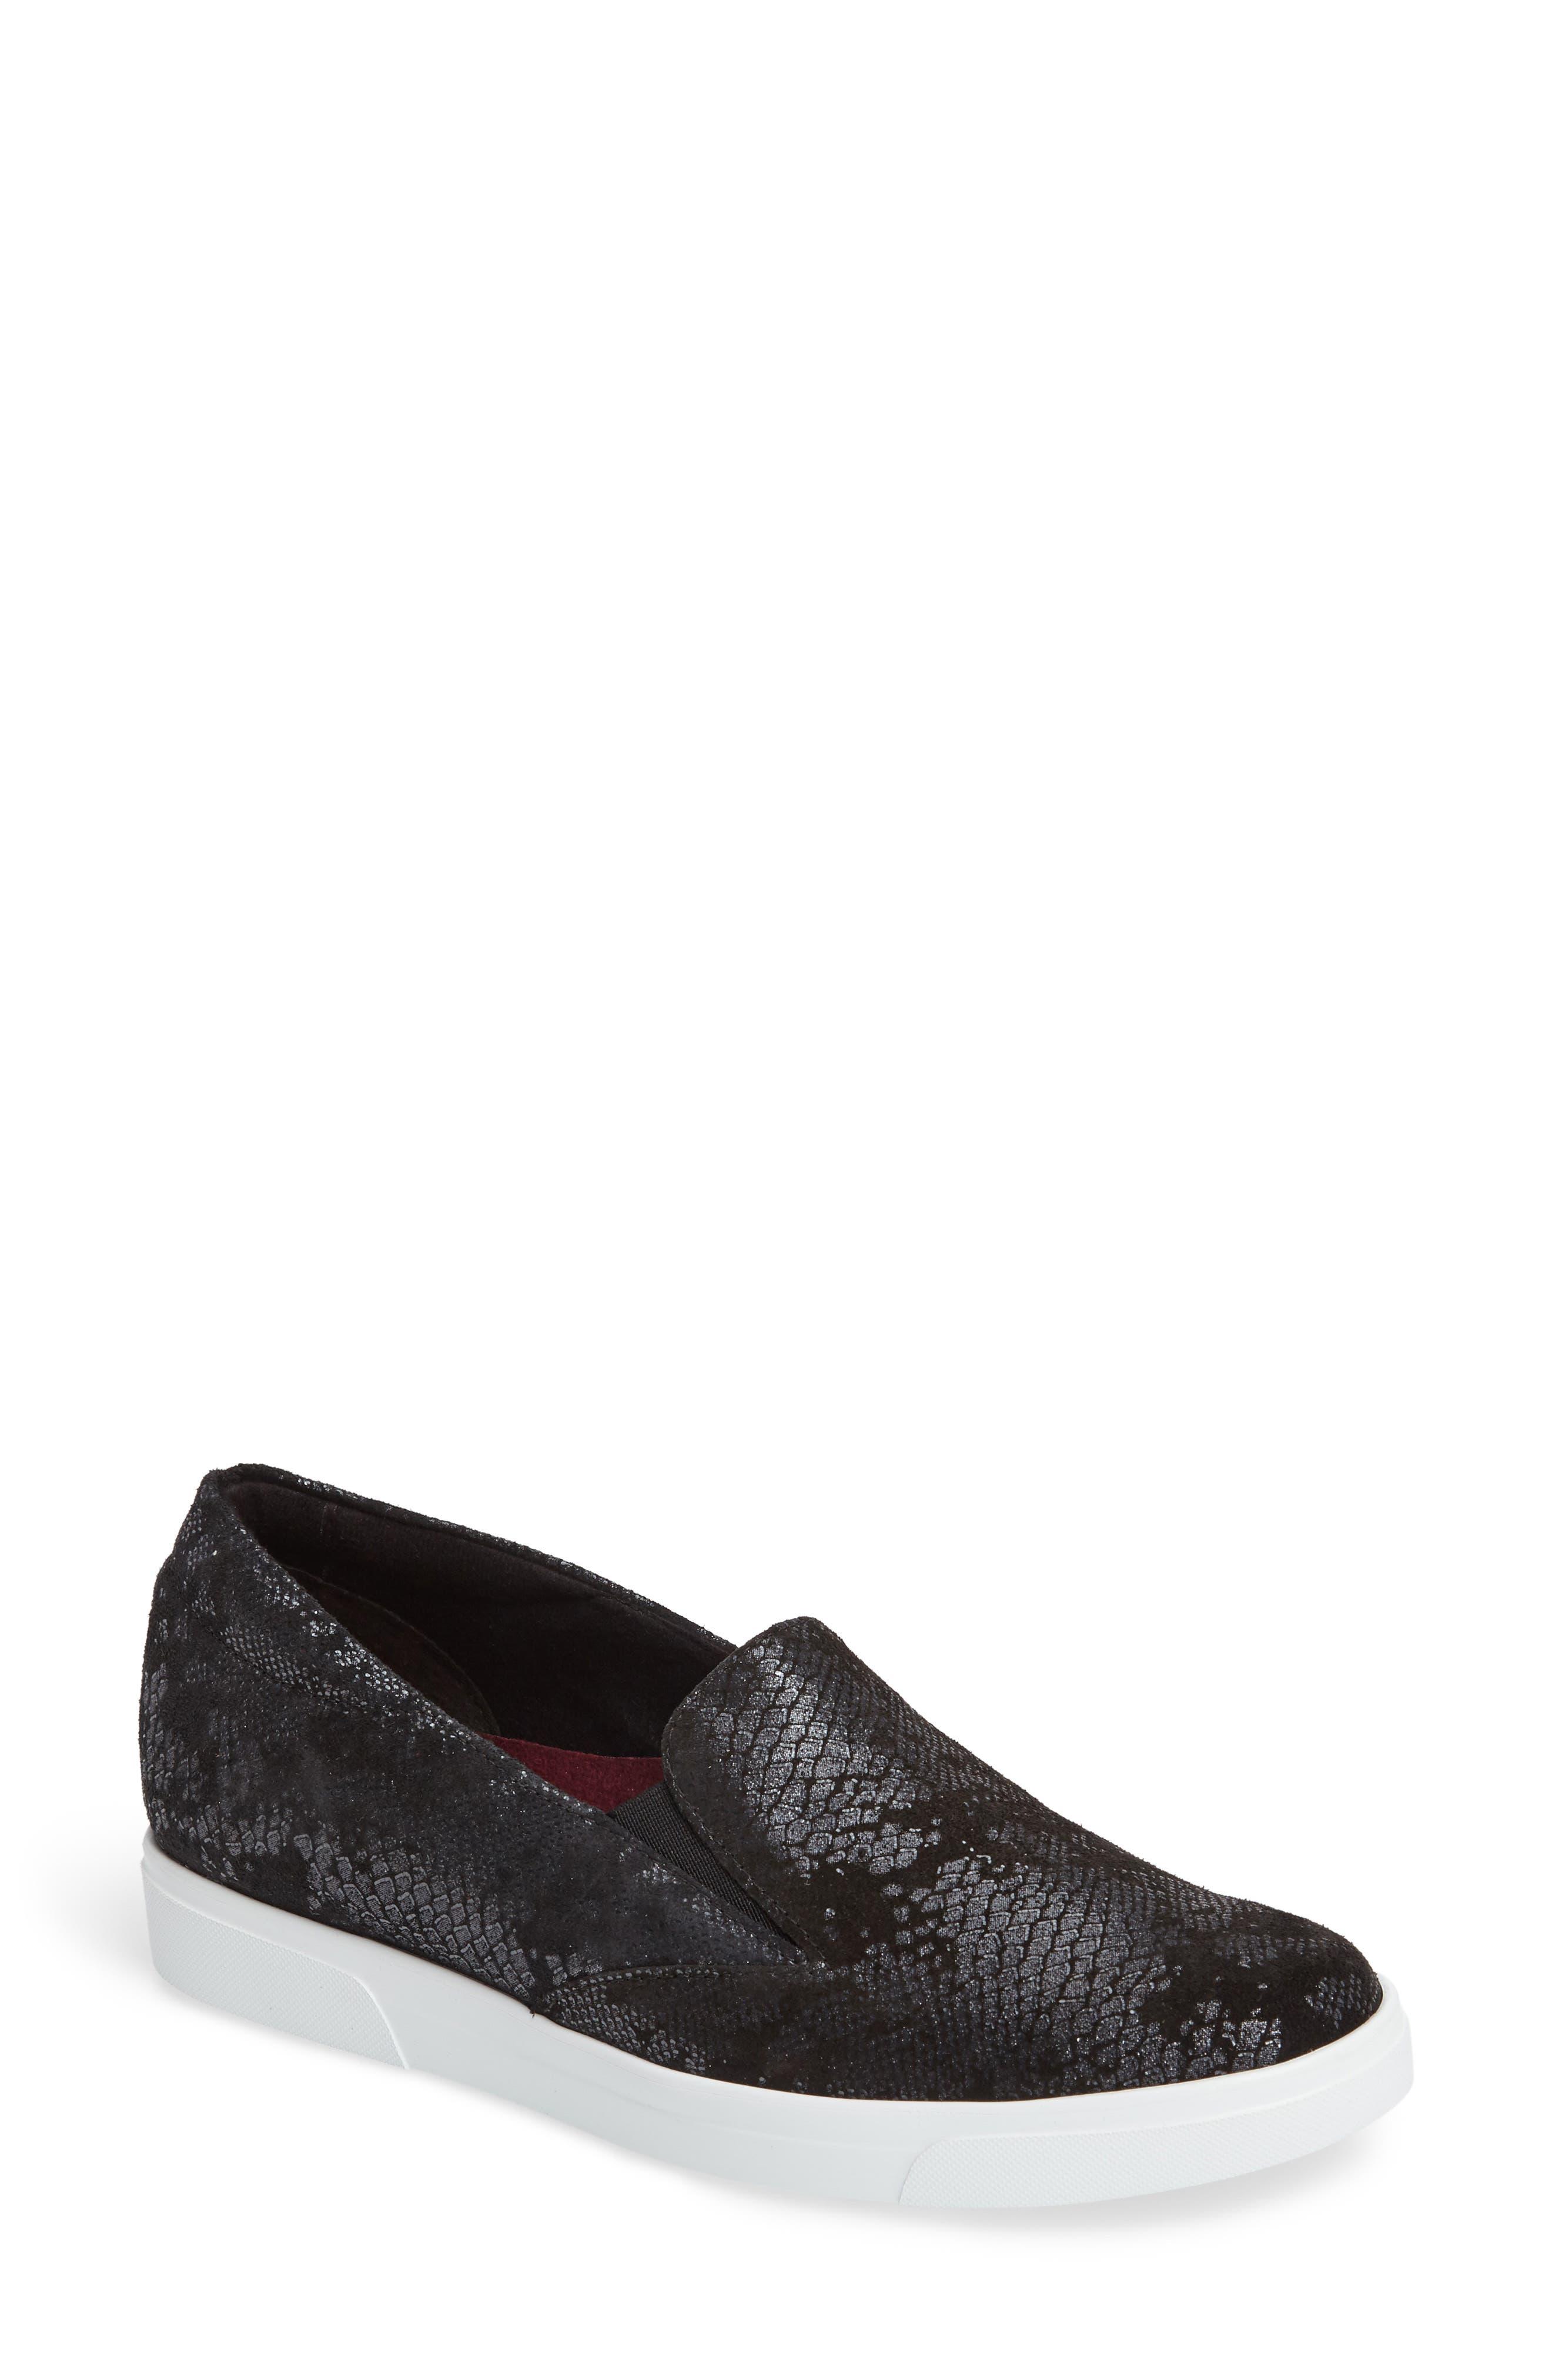 Main Image - Munro Lulu Slip-On Sneaker (Women)